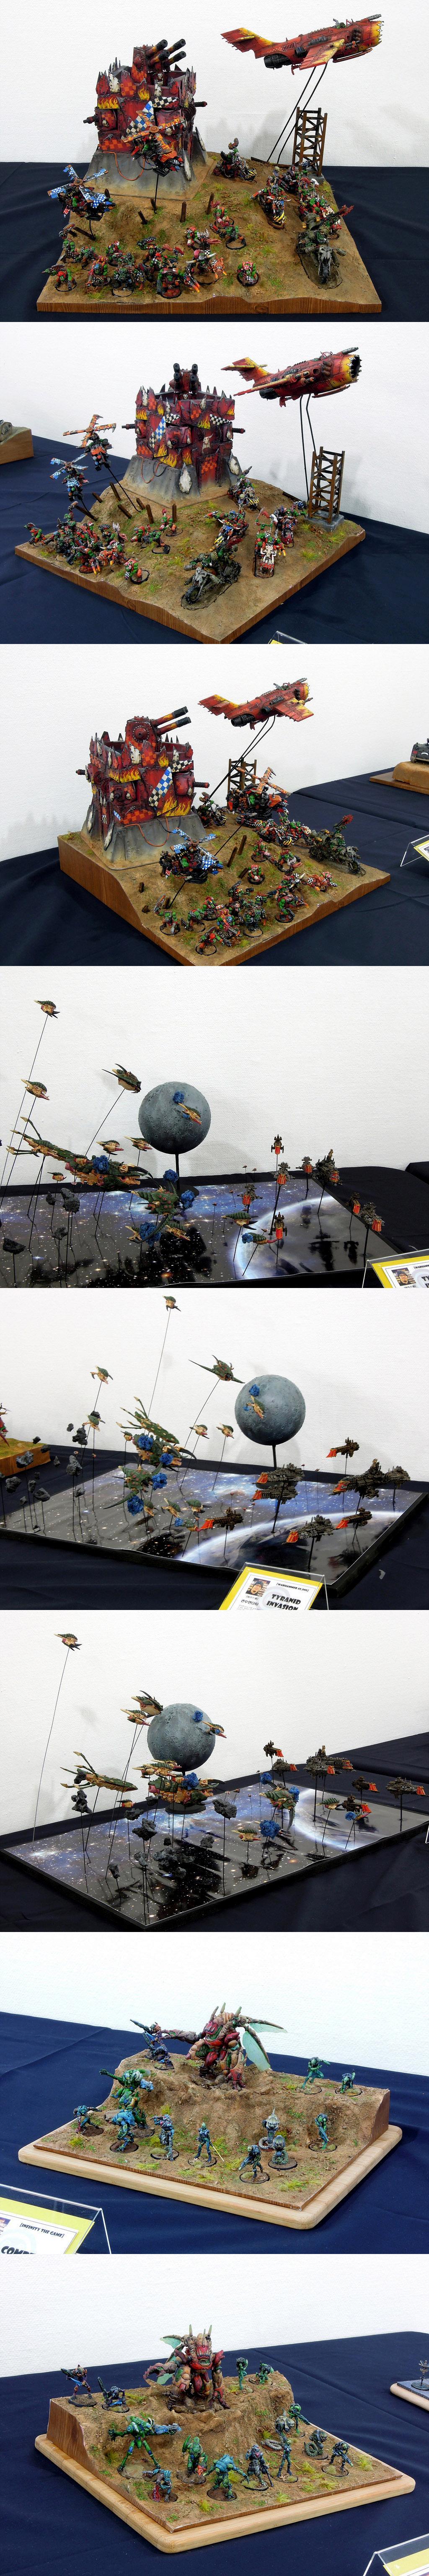 Battlefleet Gothic, Combined Army, Diorama, Display, Exhibition, Infinity, Orks, Warhammer 40,000, Warhammer Fantasy